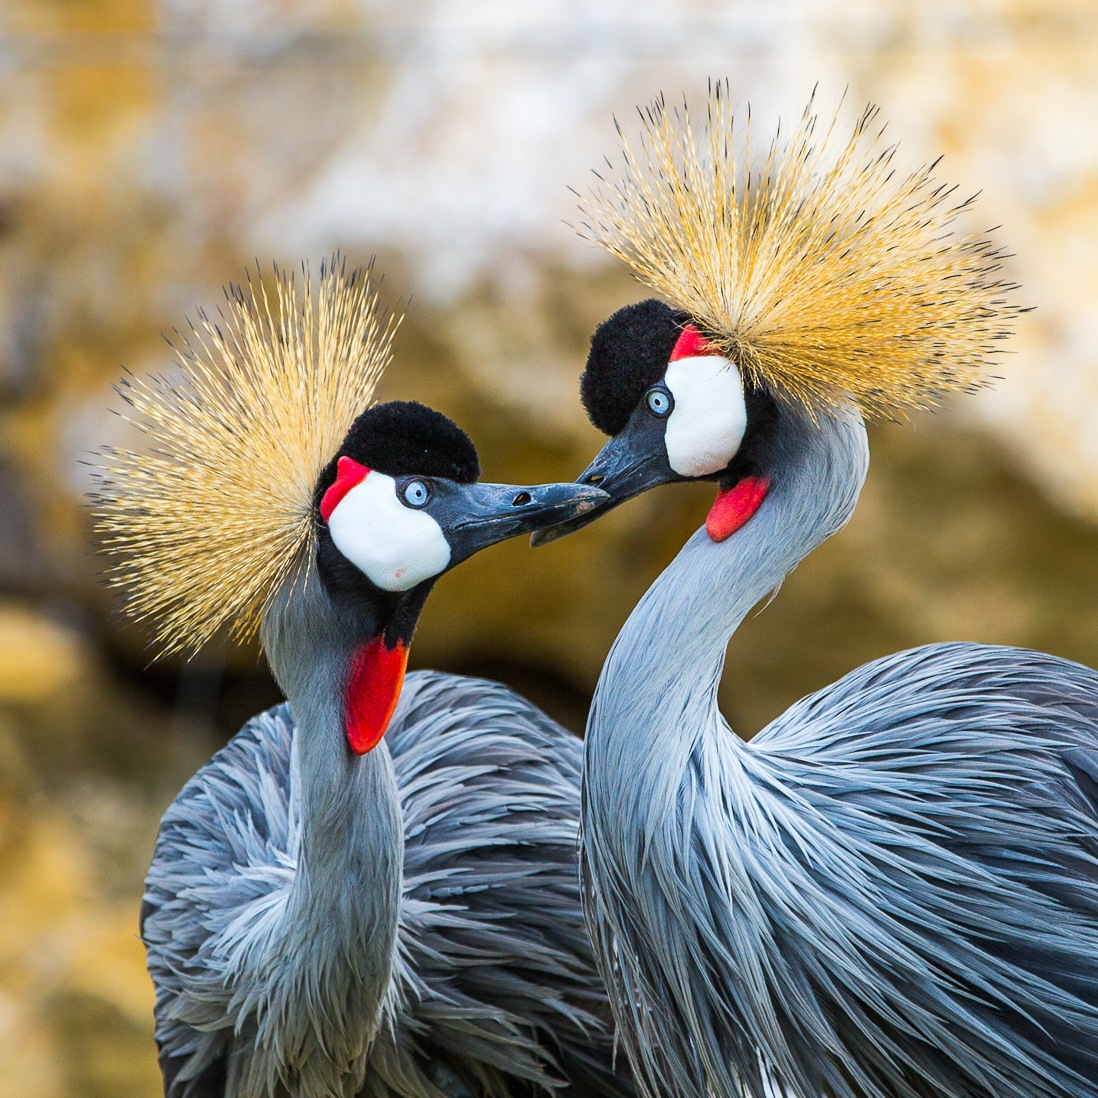 crown birds by Els Blomme